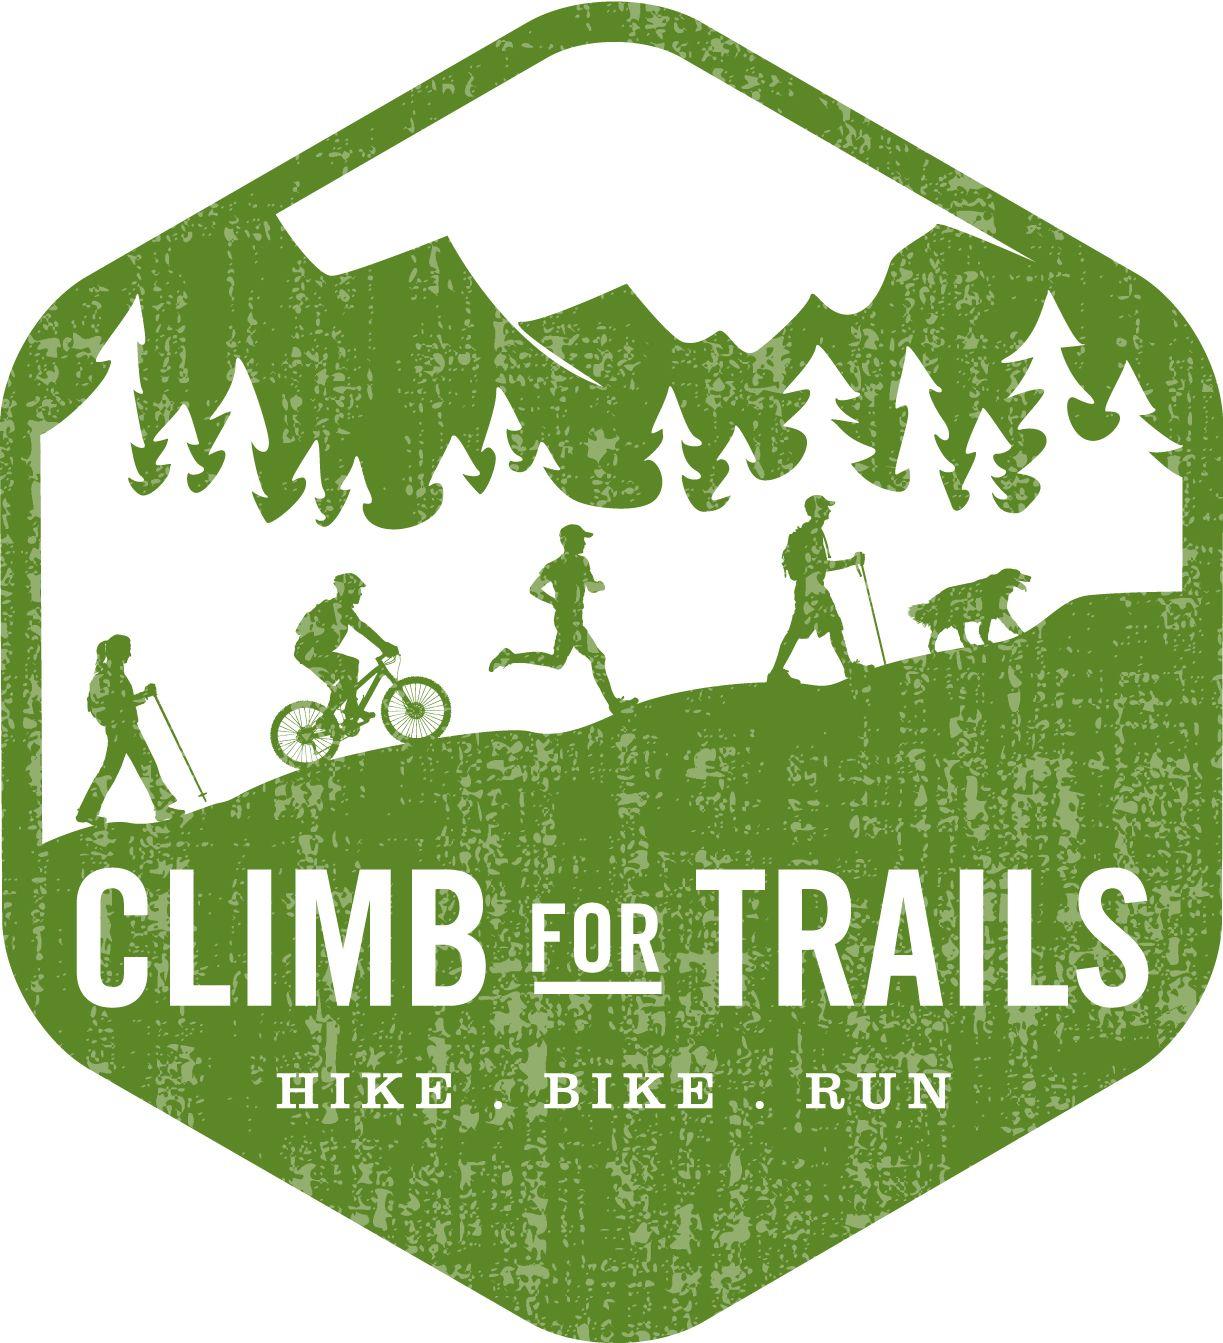 trails logo Google Search Teaching graphic design